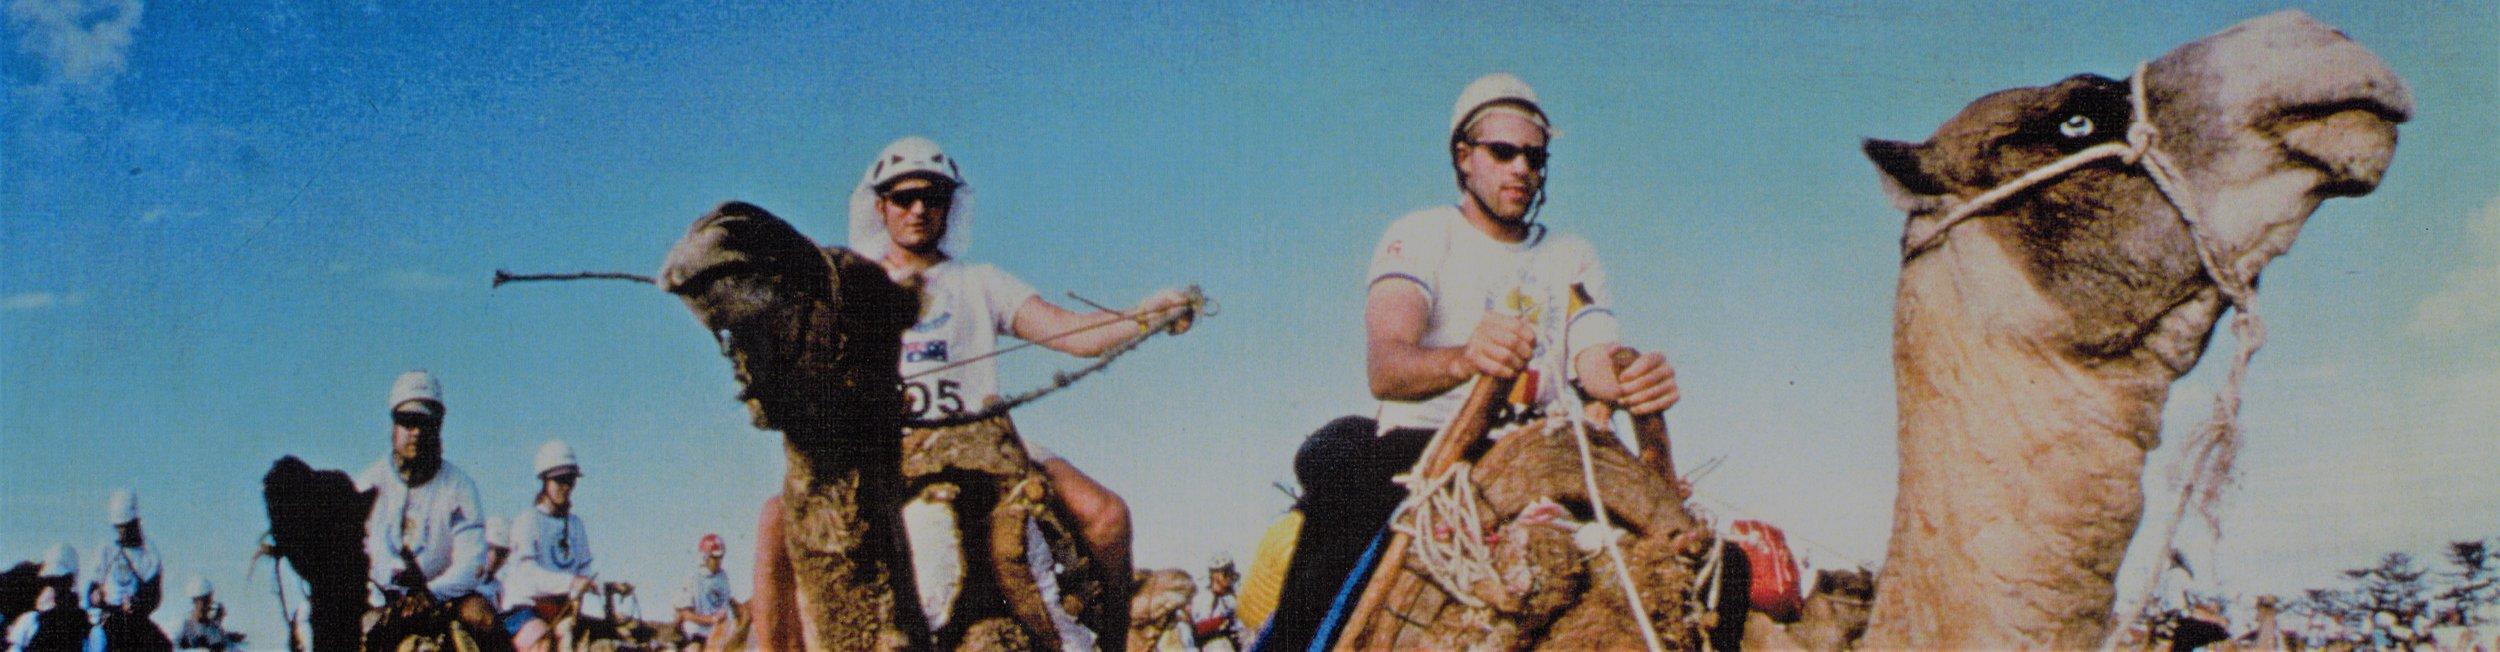 camels, Eco-Challenge 1998, Morocco